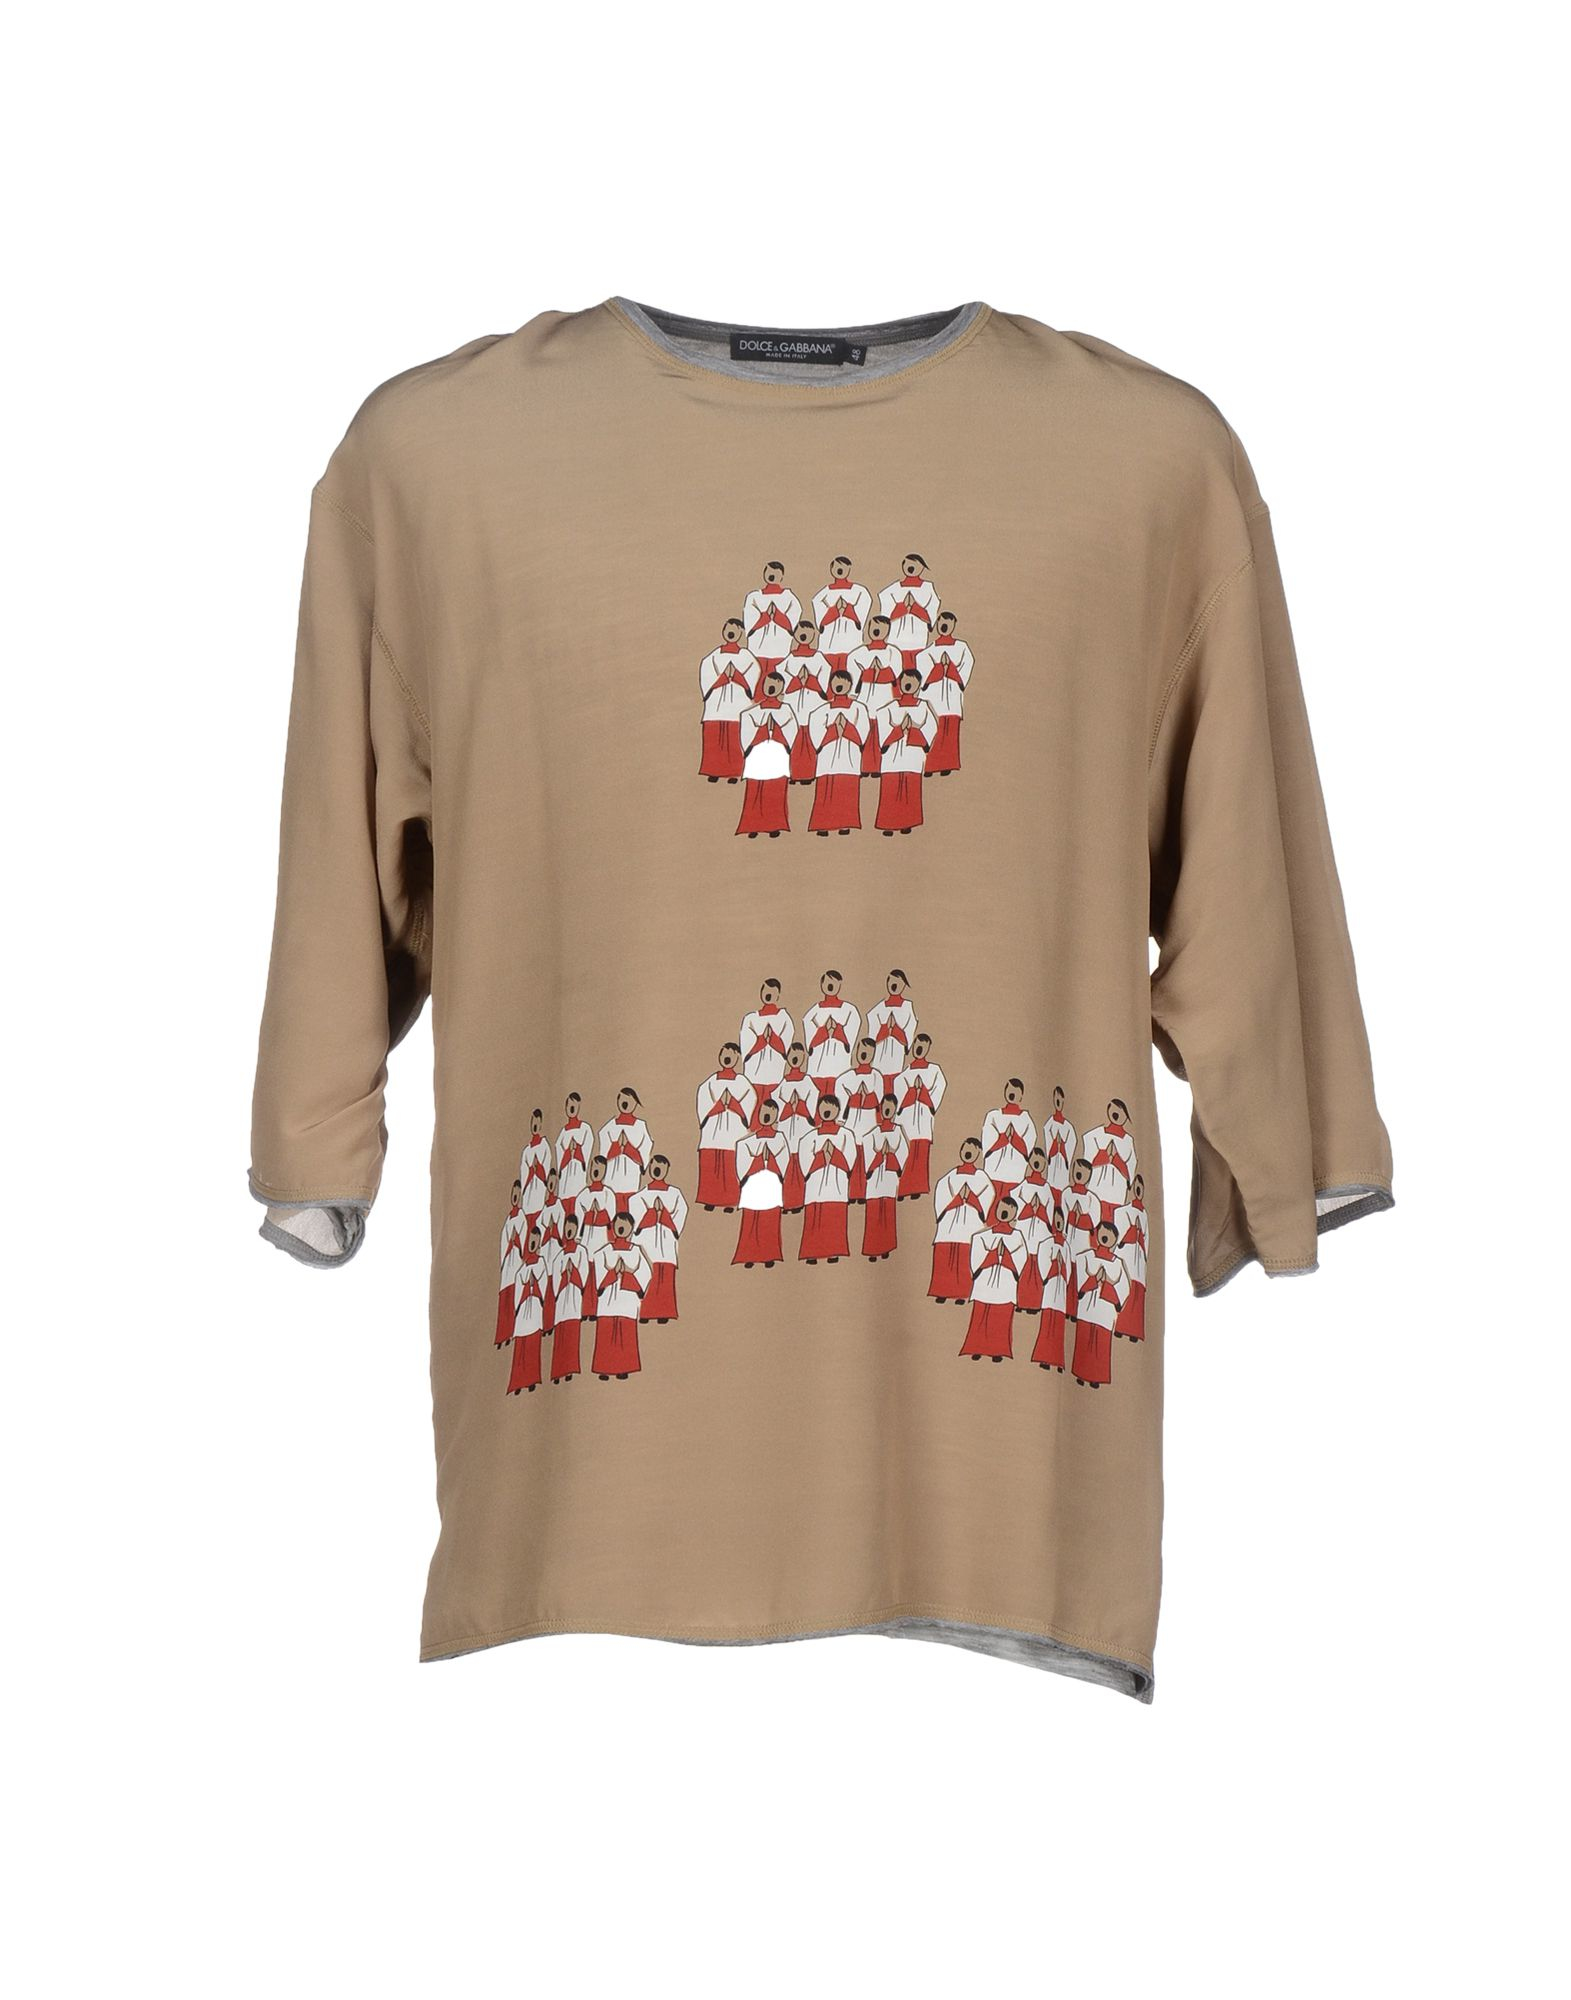 Dolce gabbana t shirt in brown lyst for Dolce gabbana t shirt women